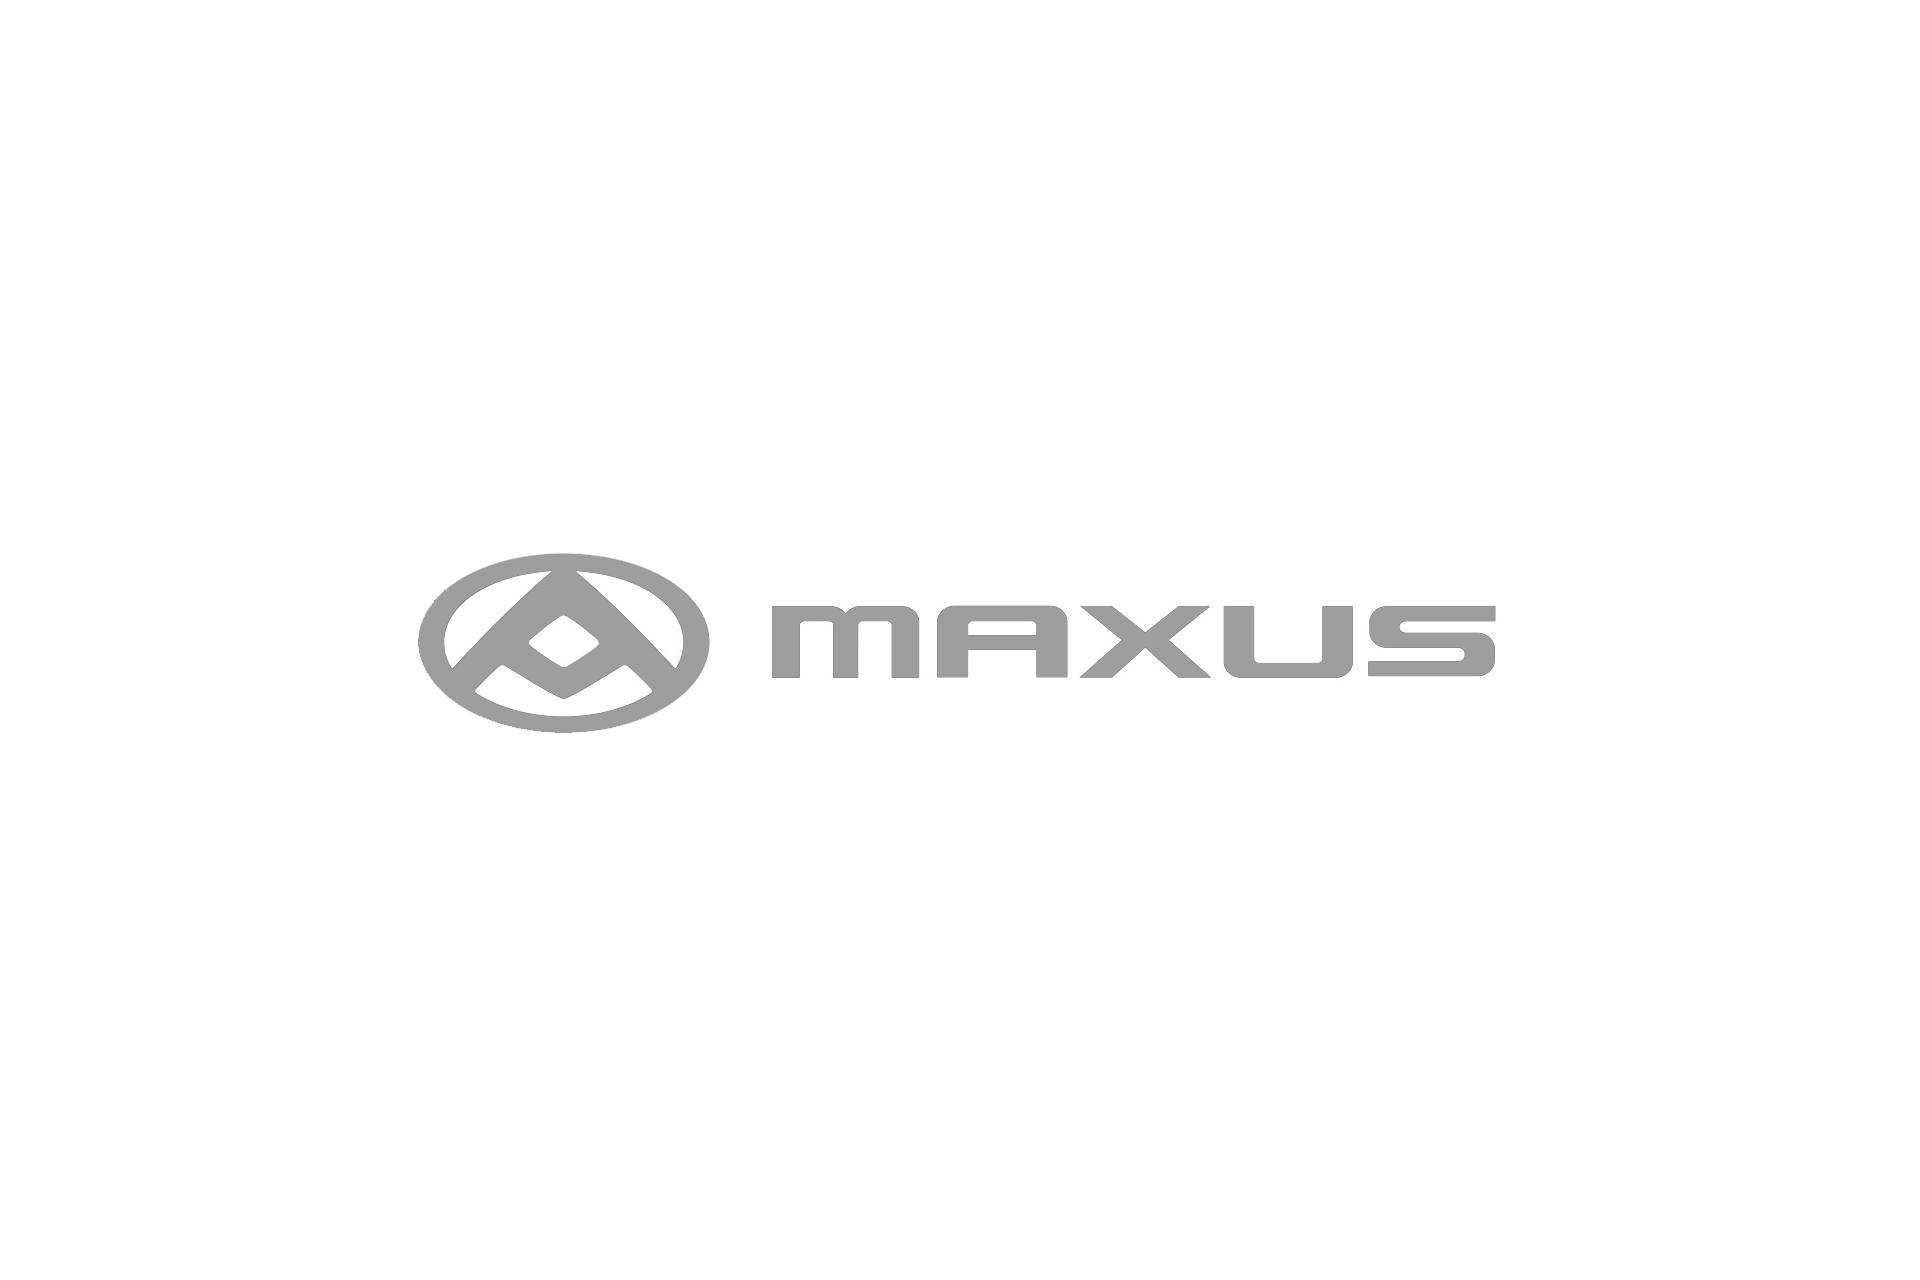 maxus logo web